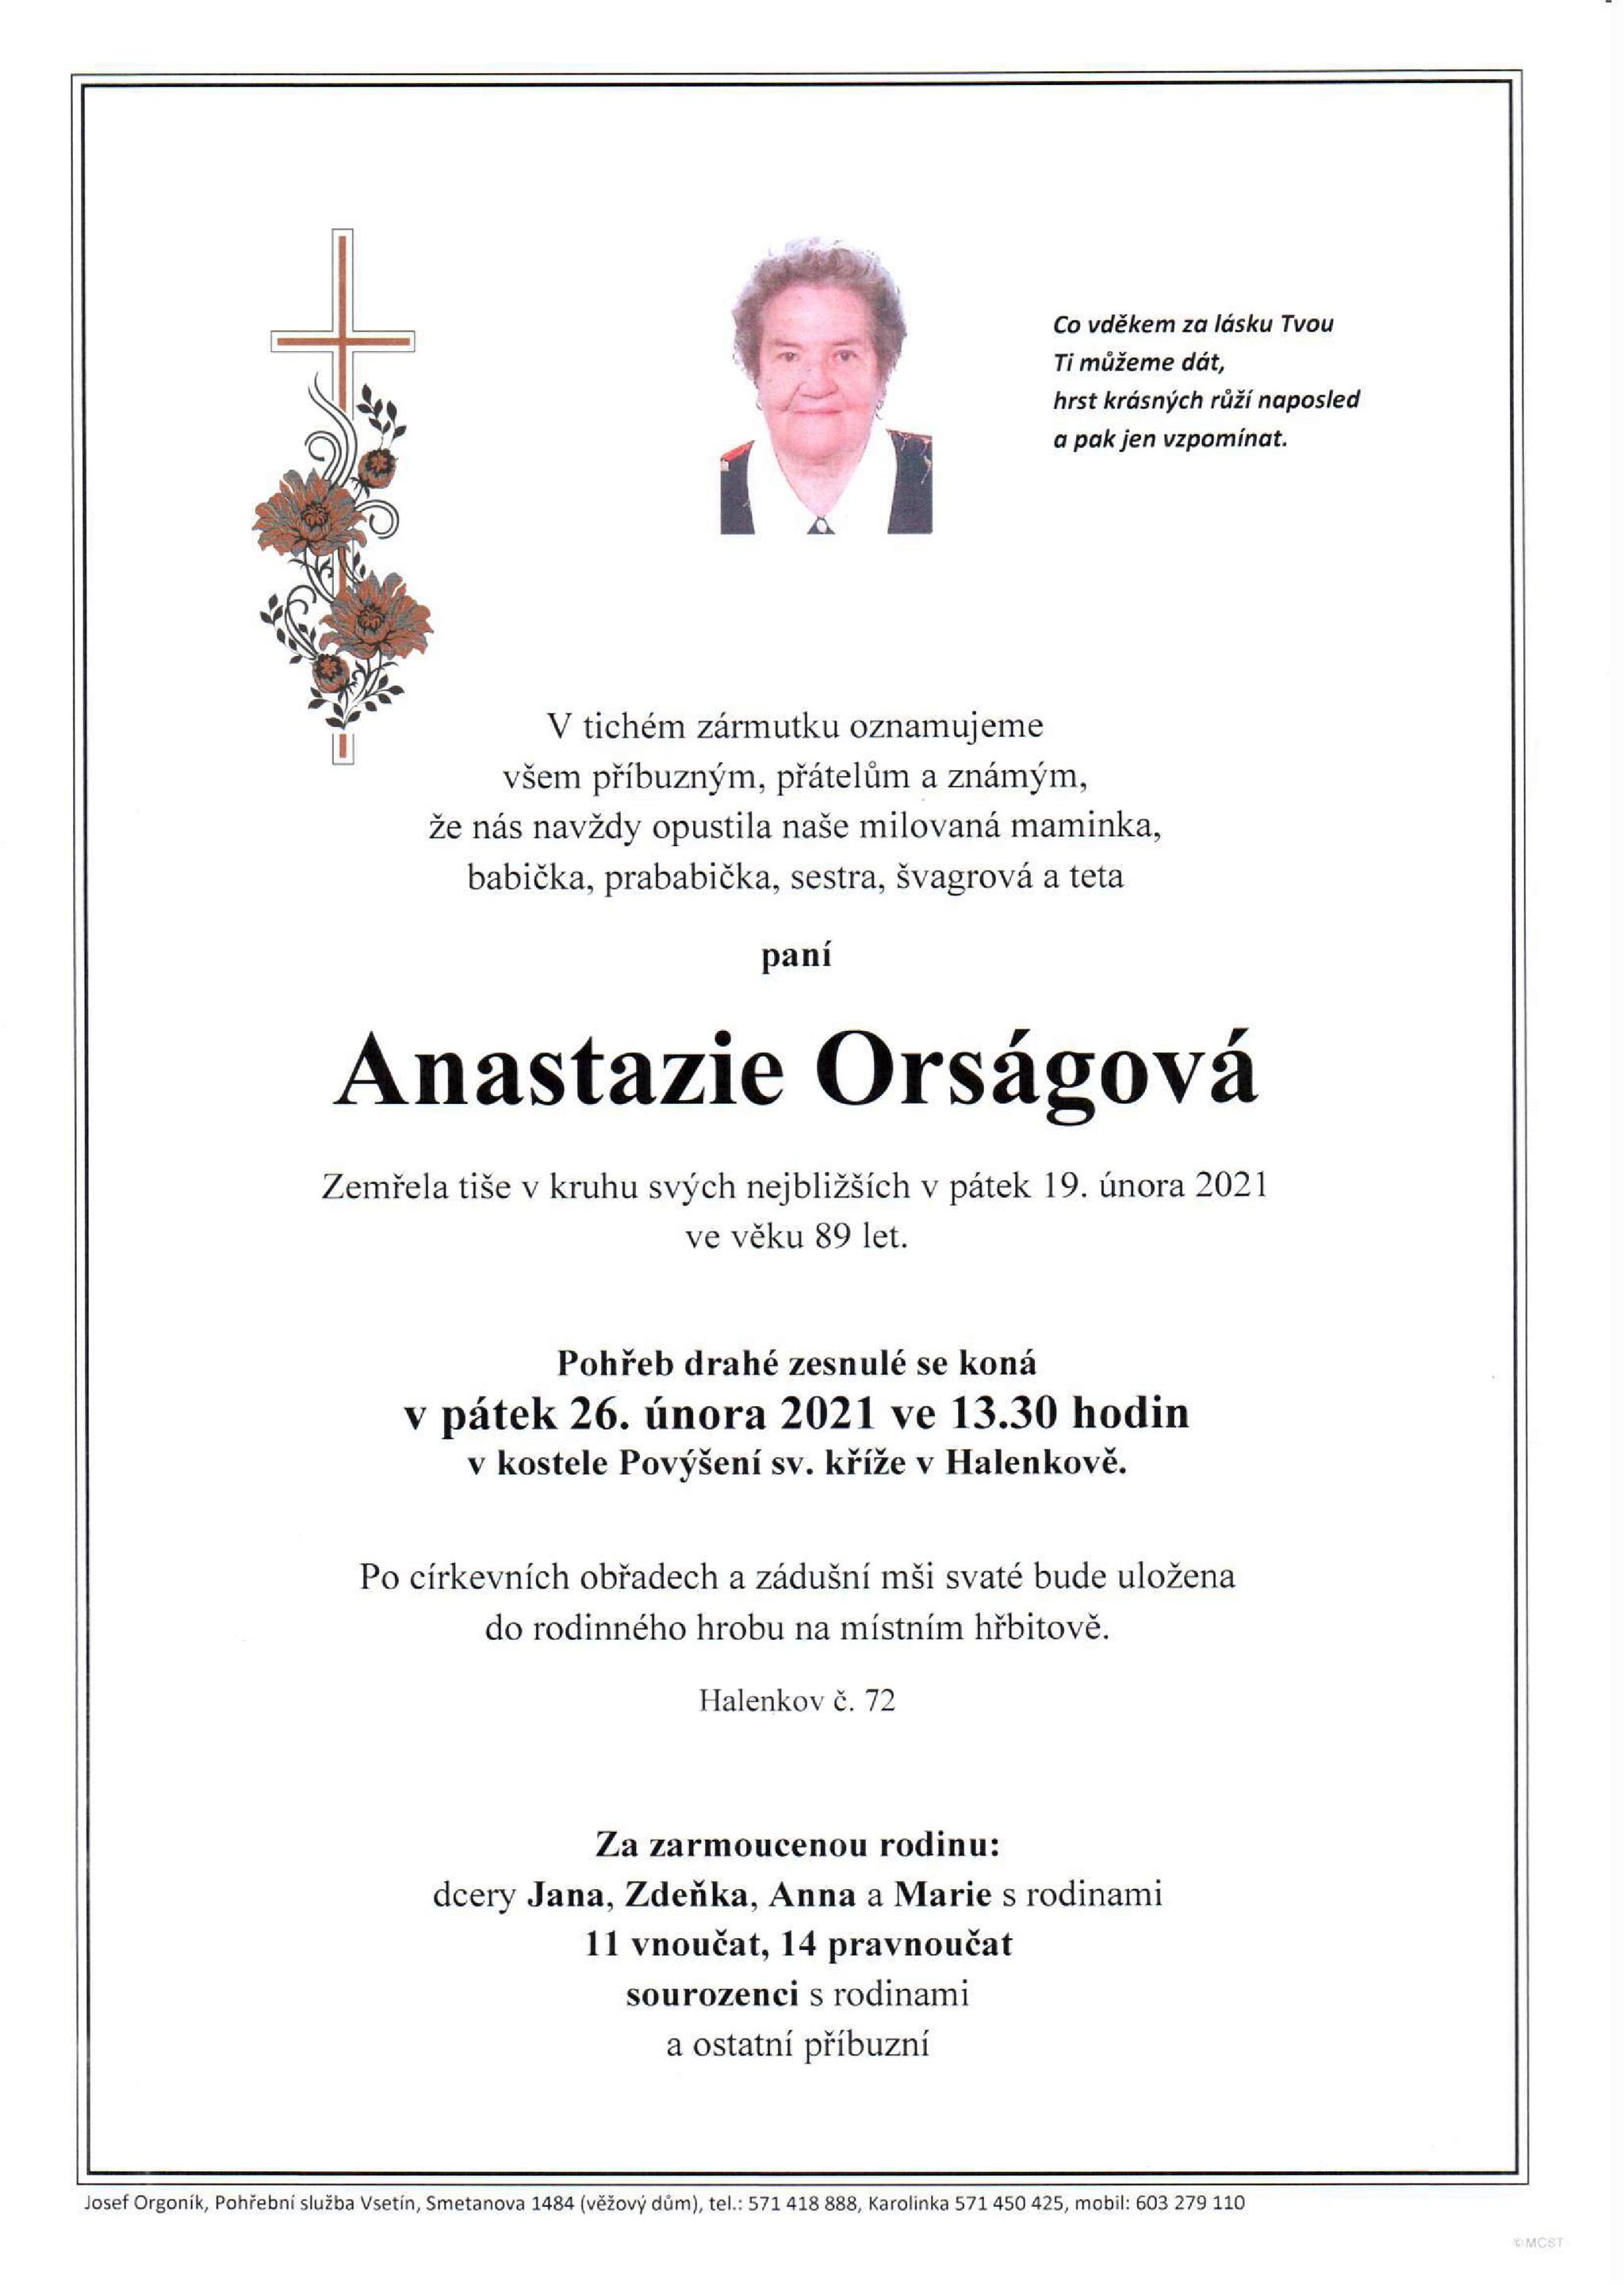 Anastazie Orságová